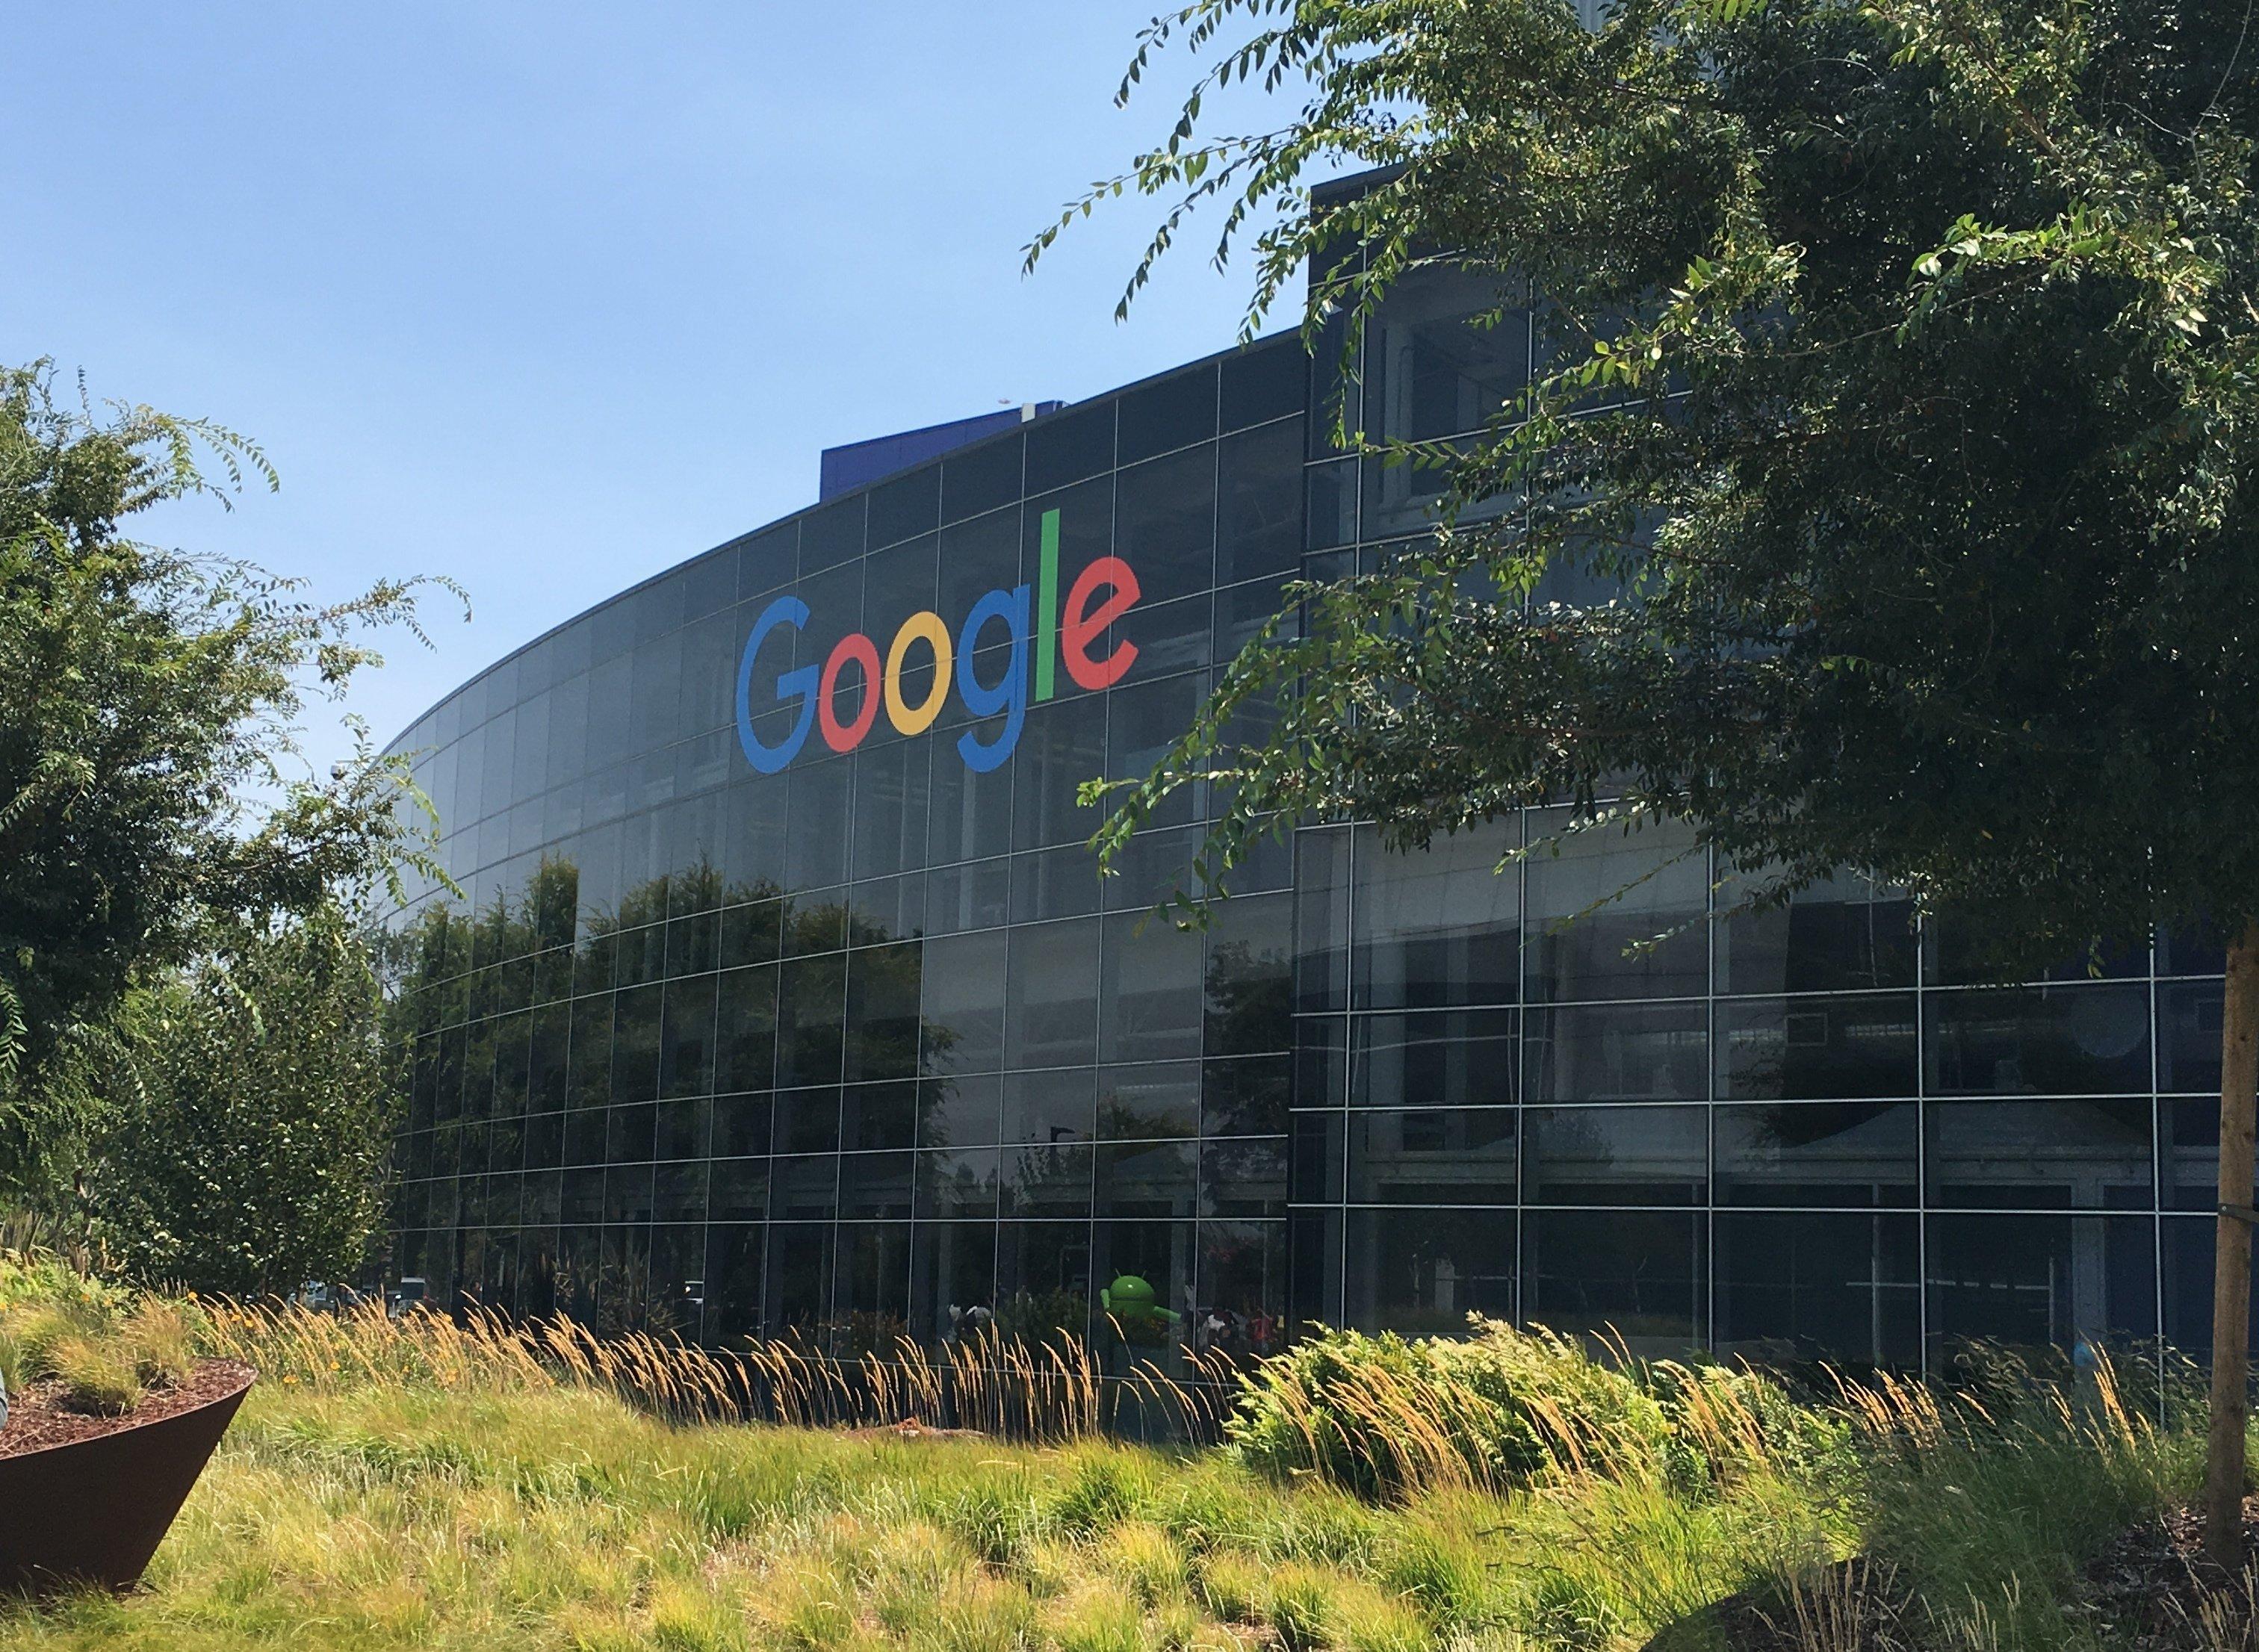 Googleplex HQ cropped قانون ۲۰ درصد گوگل چیست و چرا باید در استارتاپ خود از آن استفاده کنید؟ اخبار IT